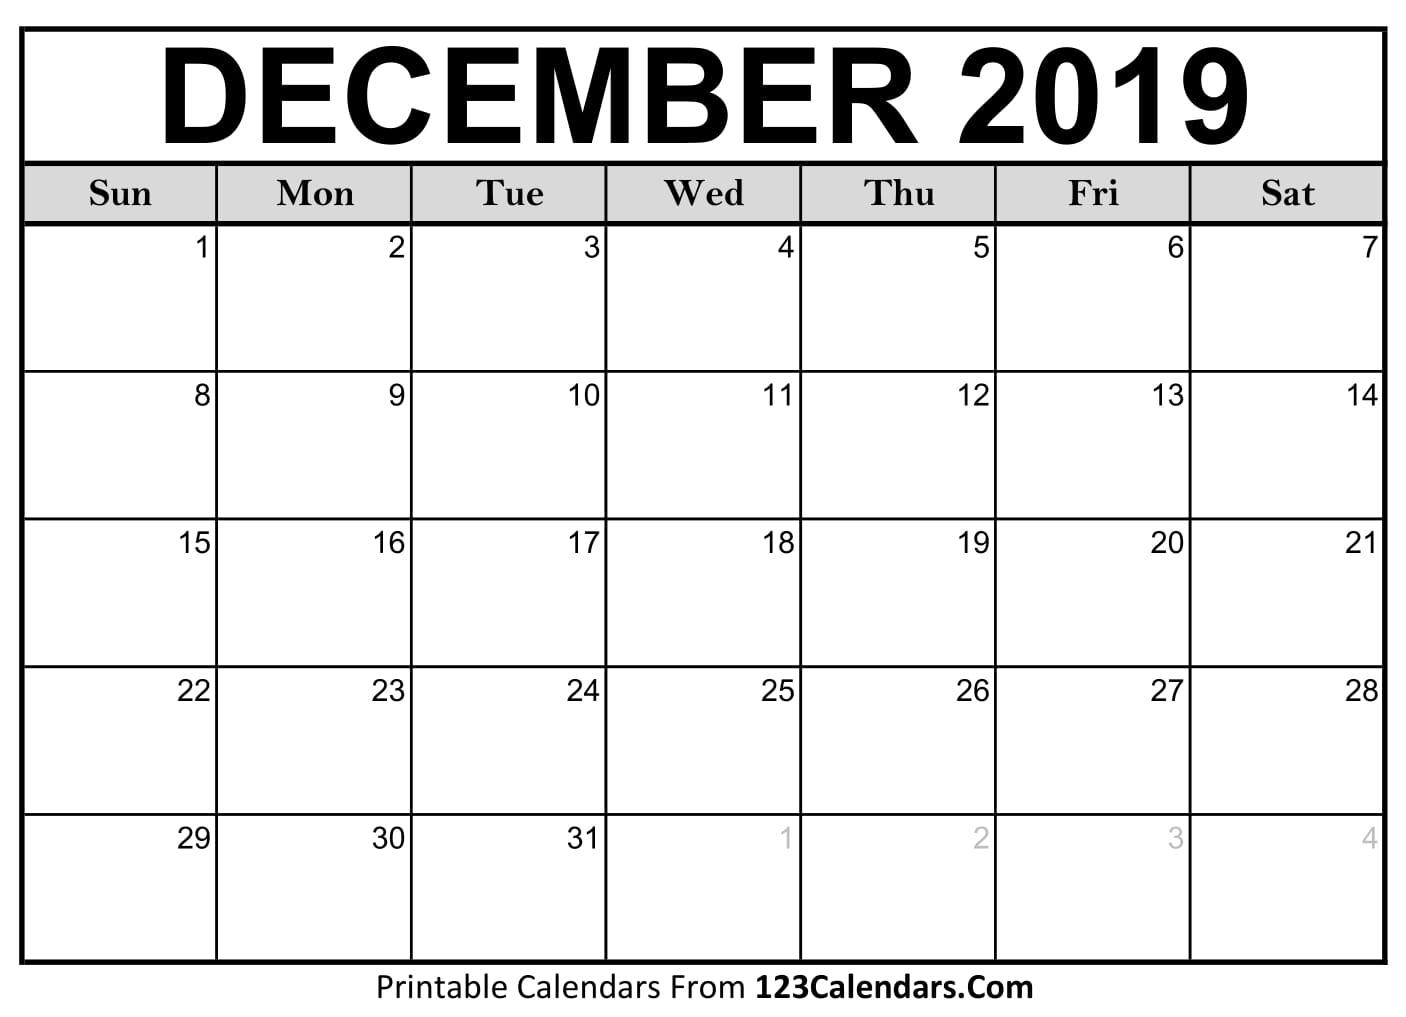 Get Printable Calendar Templates 2019 August Through December ⋆ The regarding Printable Calendar Templates August Through December